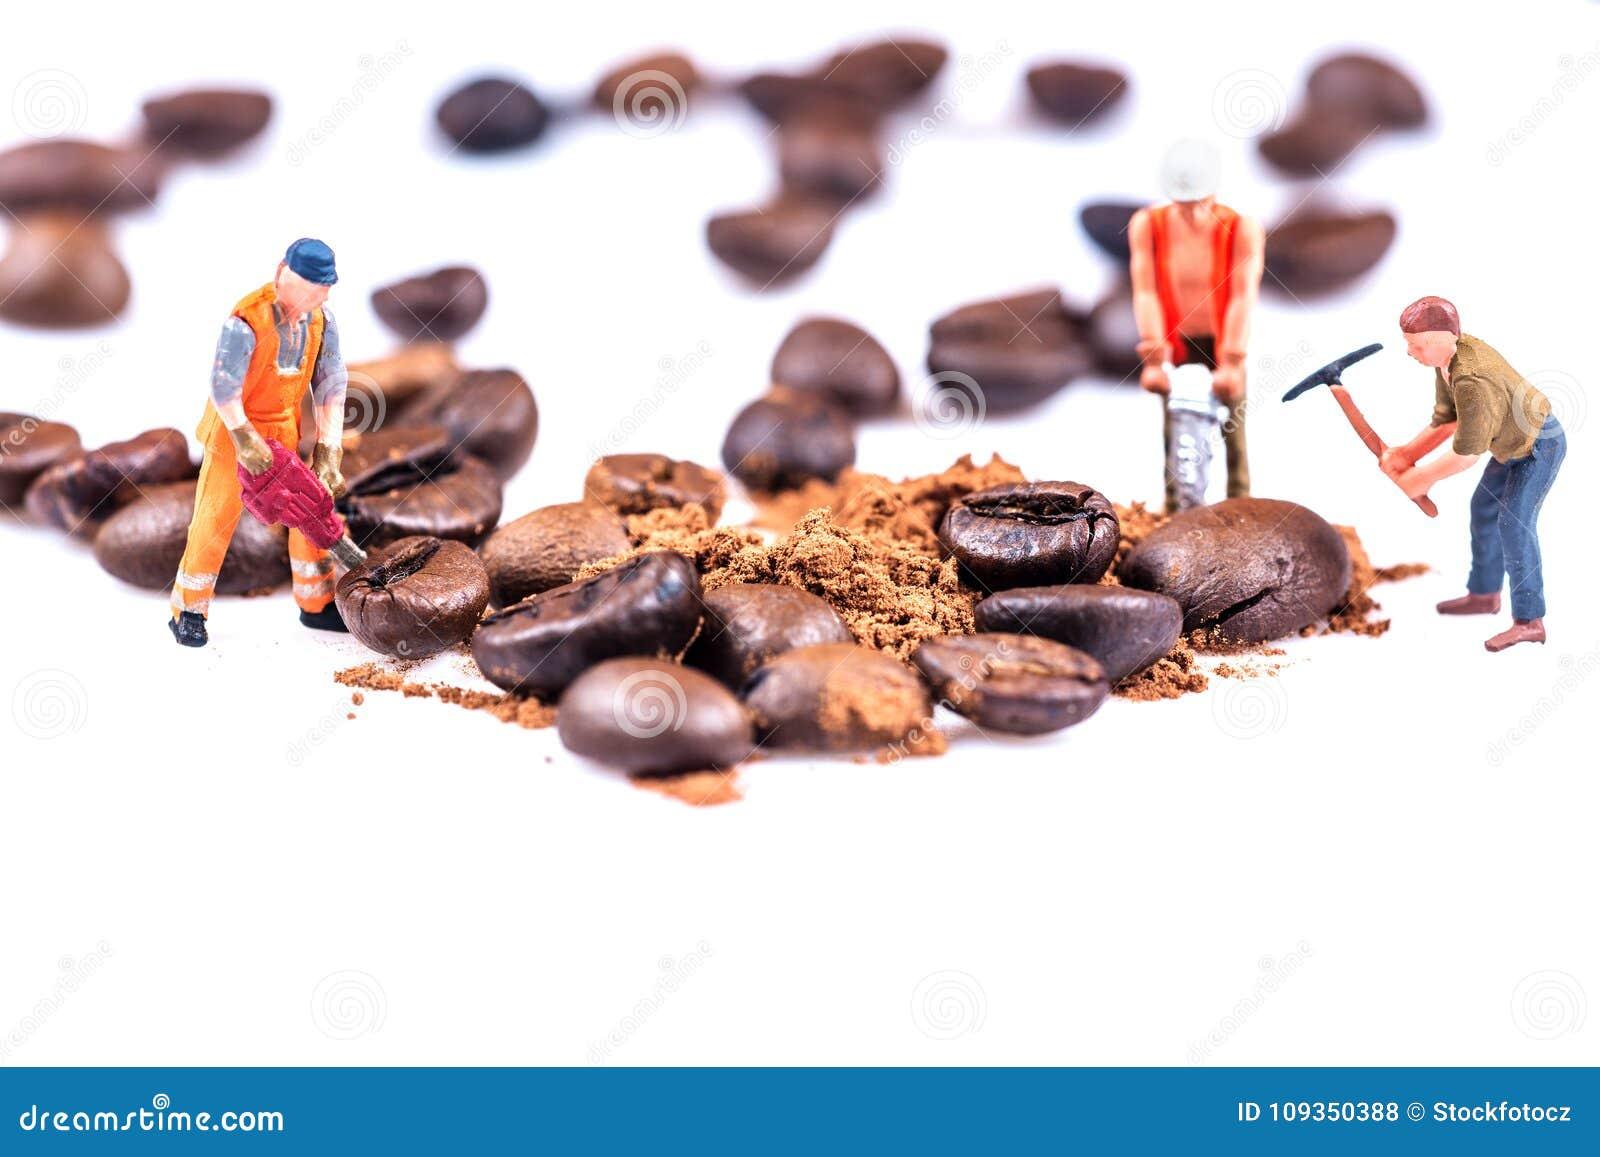 Figures working on coffee